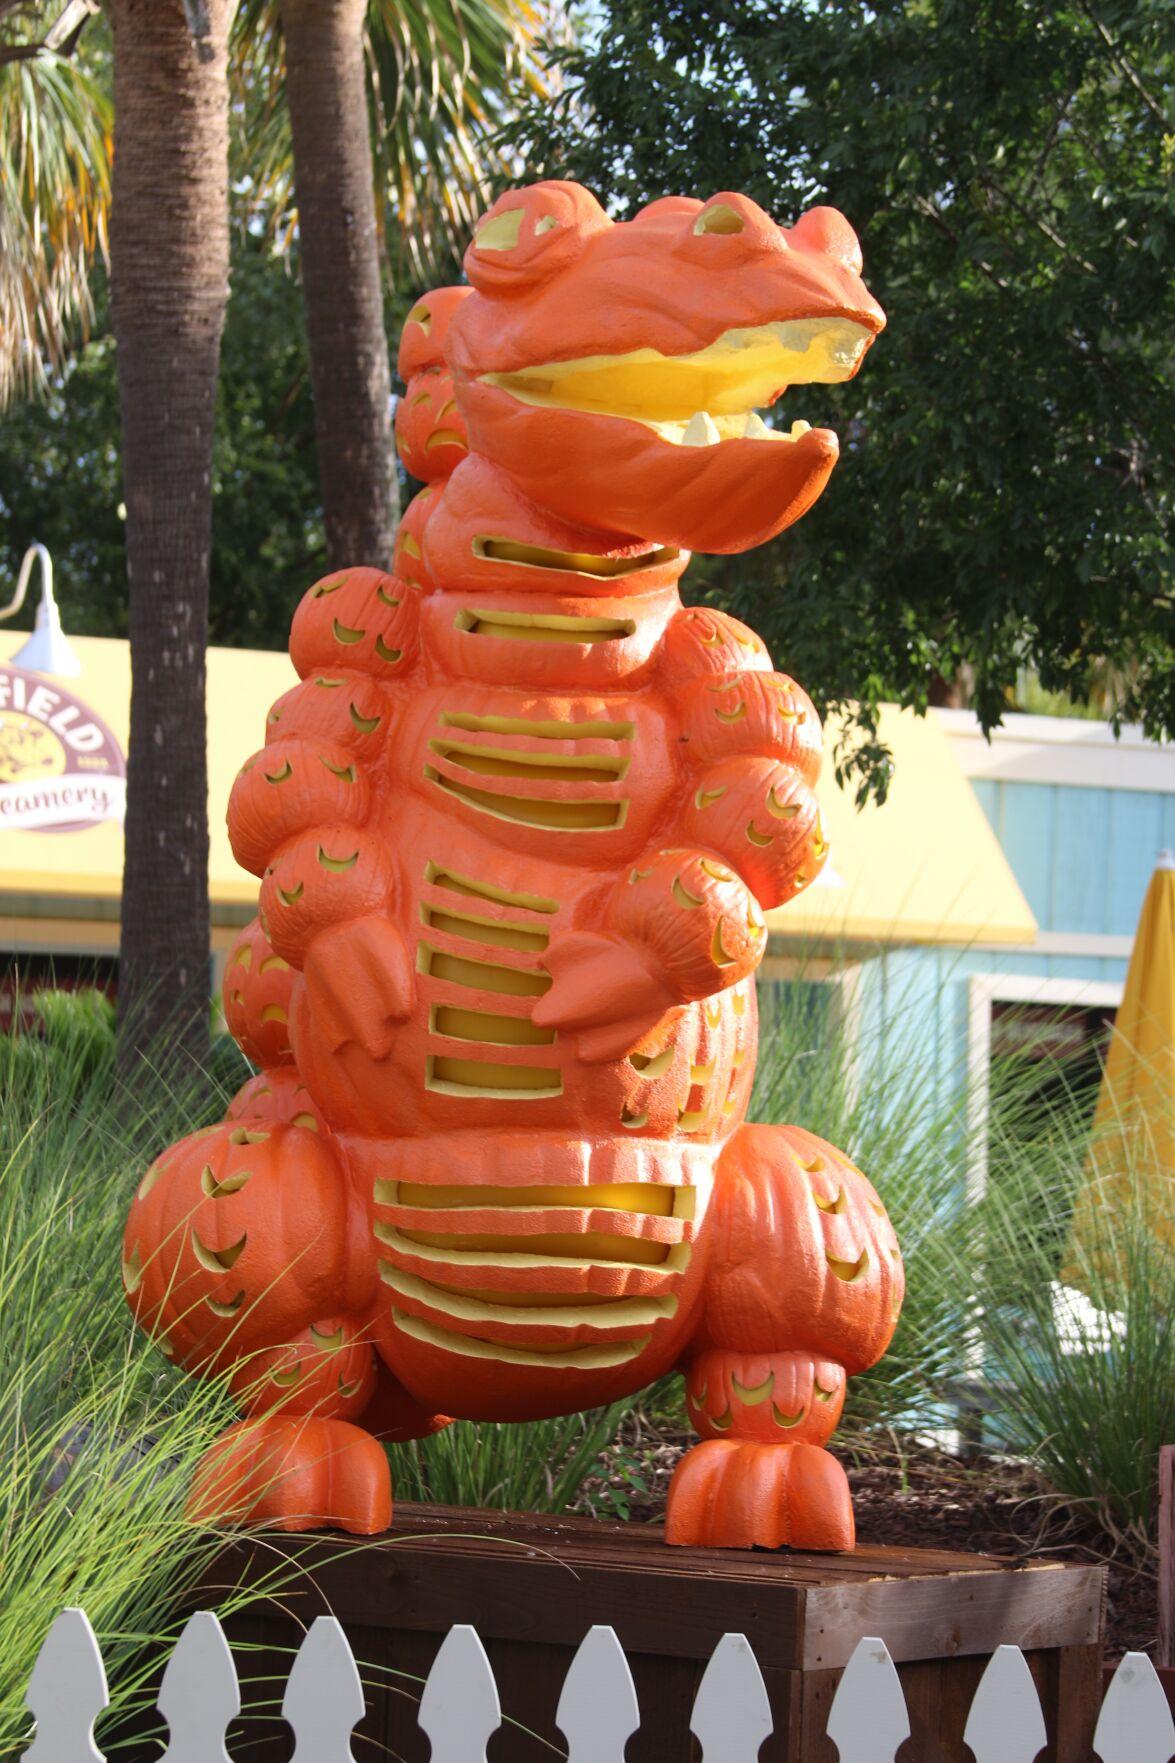 Great Pumpkin LumiNights 2